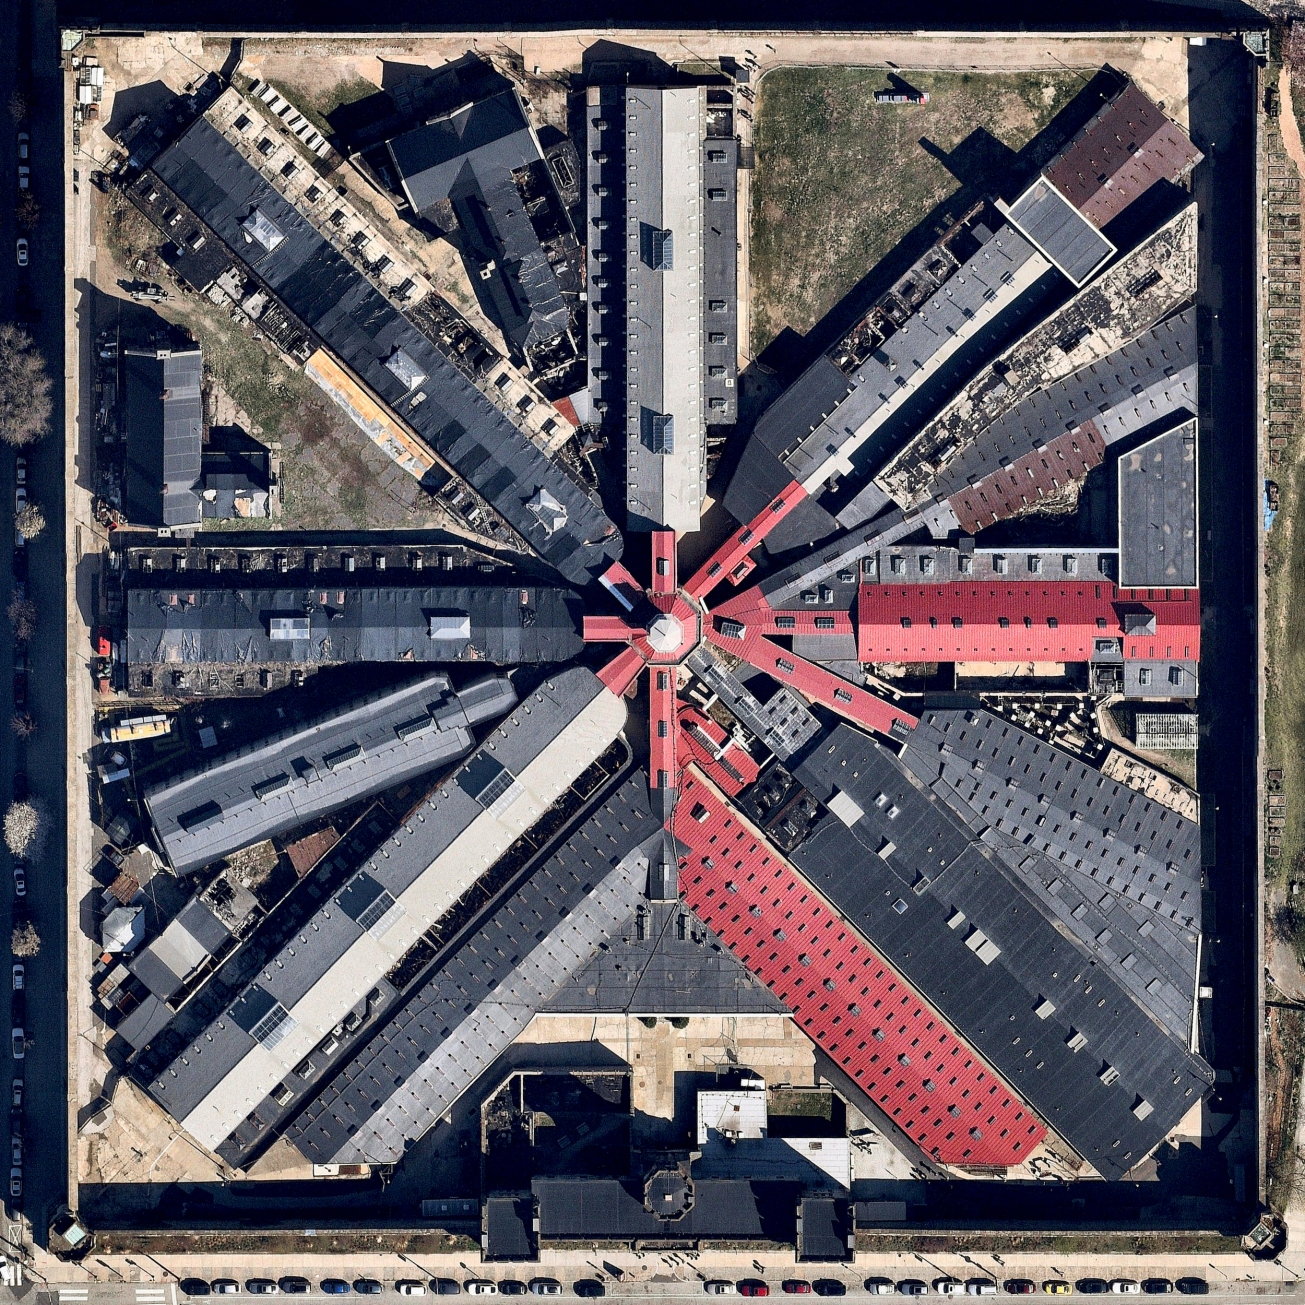 Eastern State Penitentiary Philadelphia, Pennsylvania